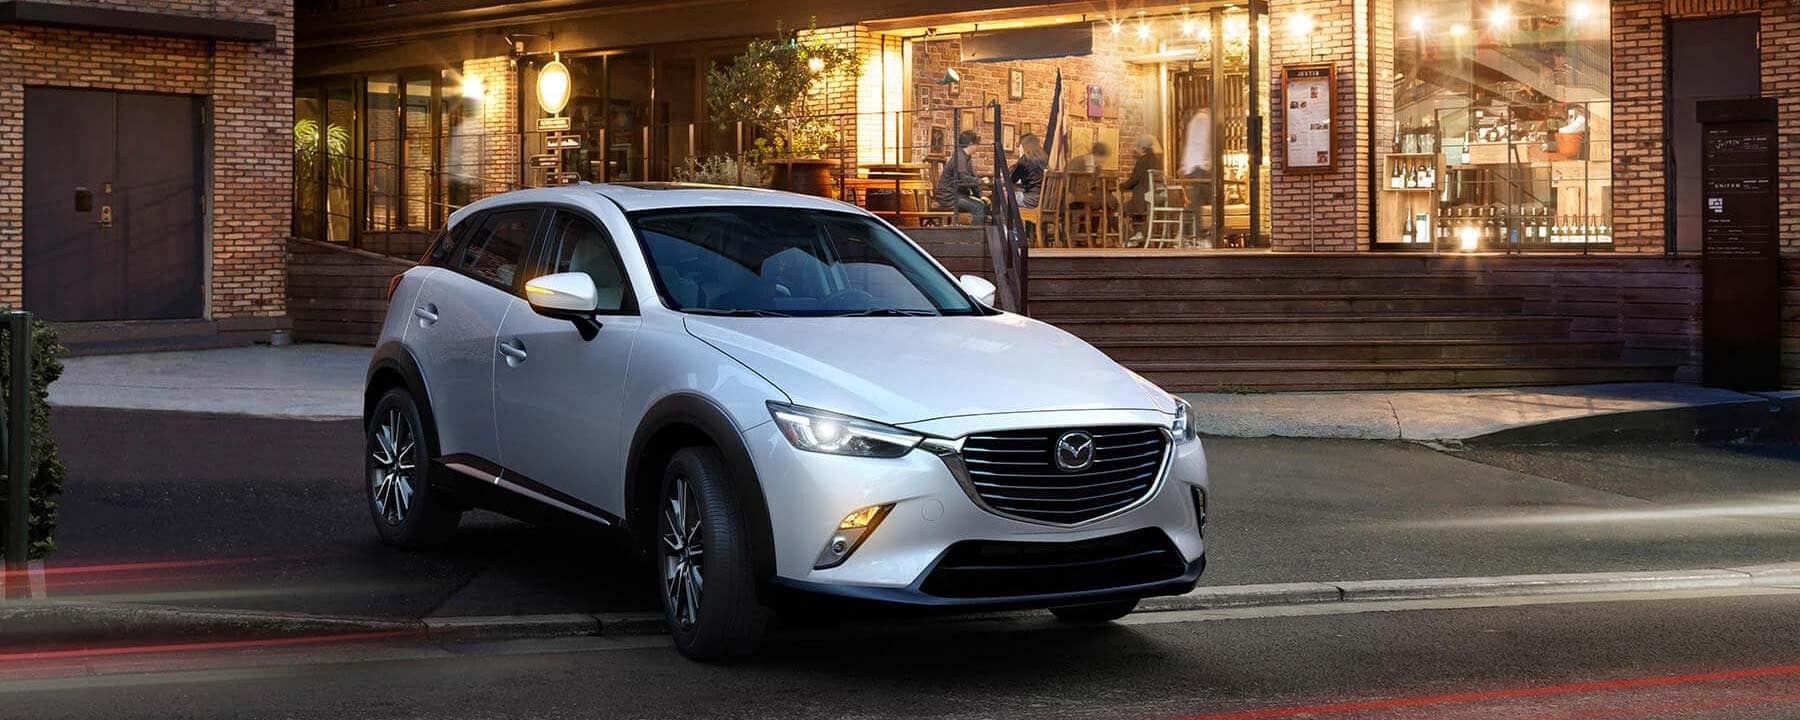 Mazda kategorisi için resim